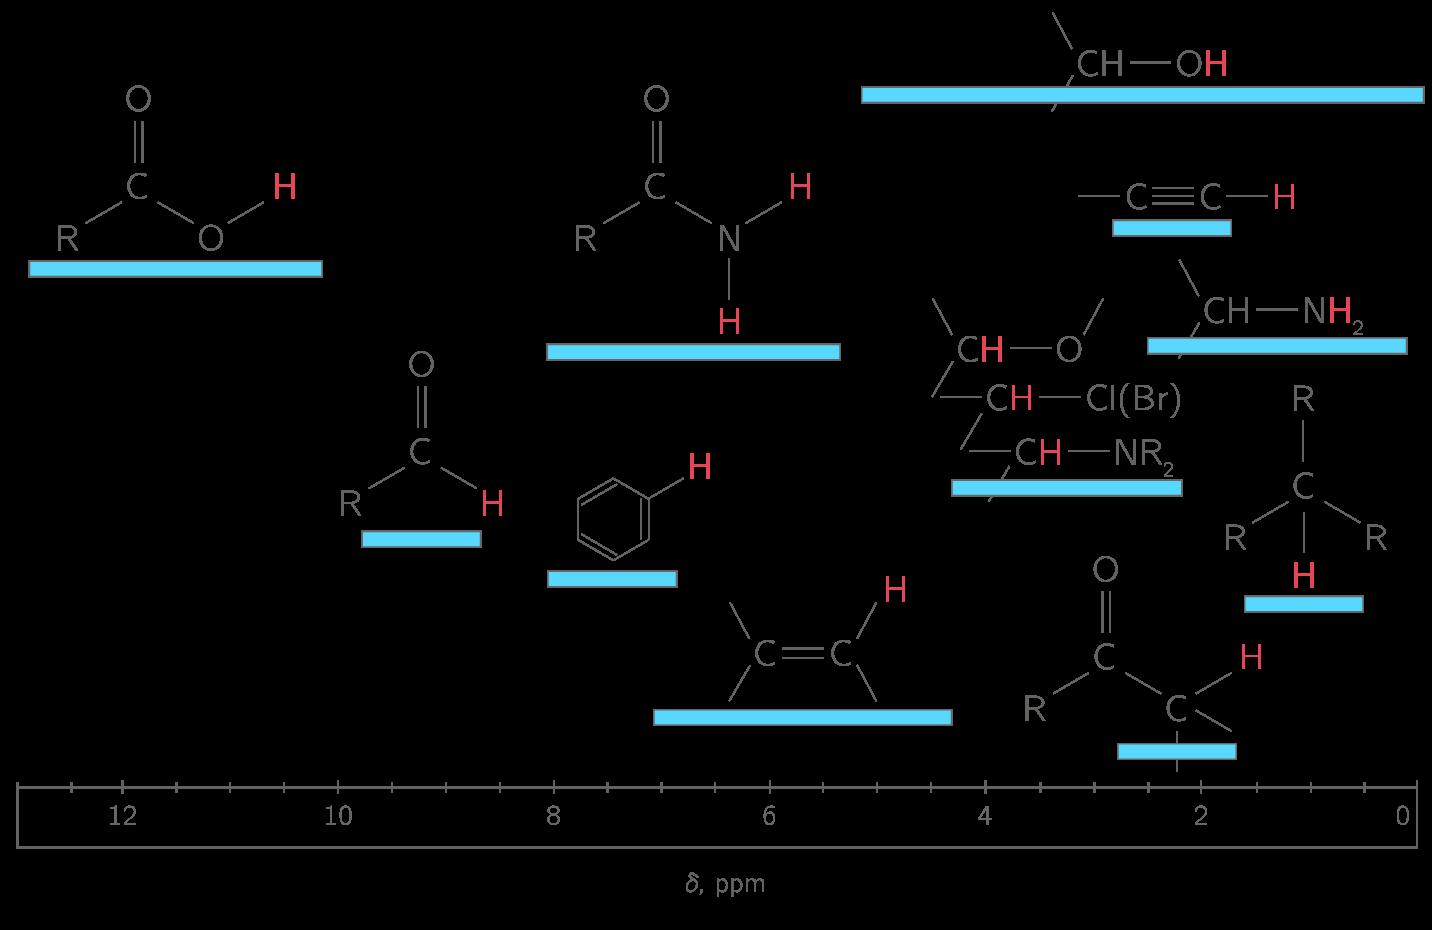 Identifier une mol cule gr ce la spectroscopie ir et rmn for Nomenclature kartable